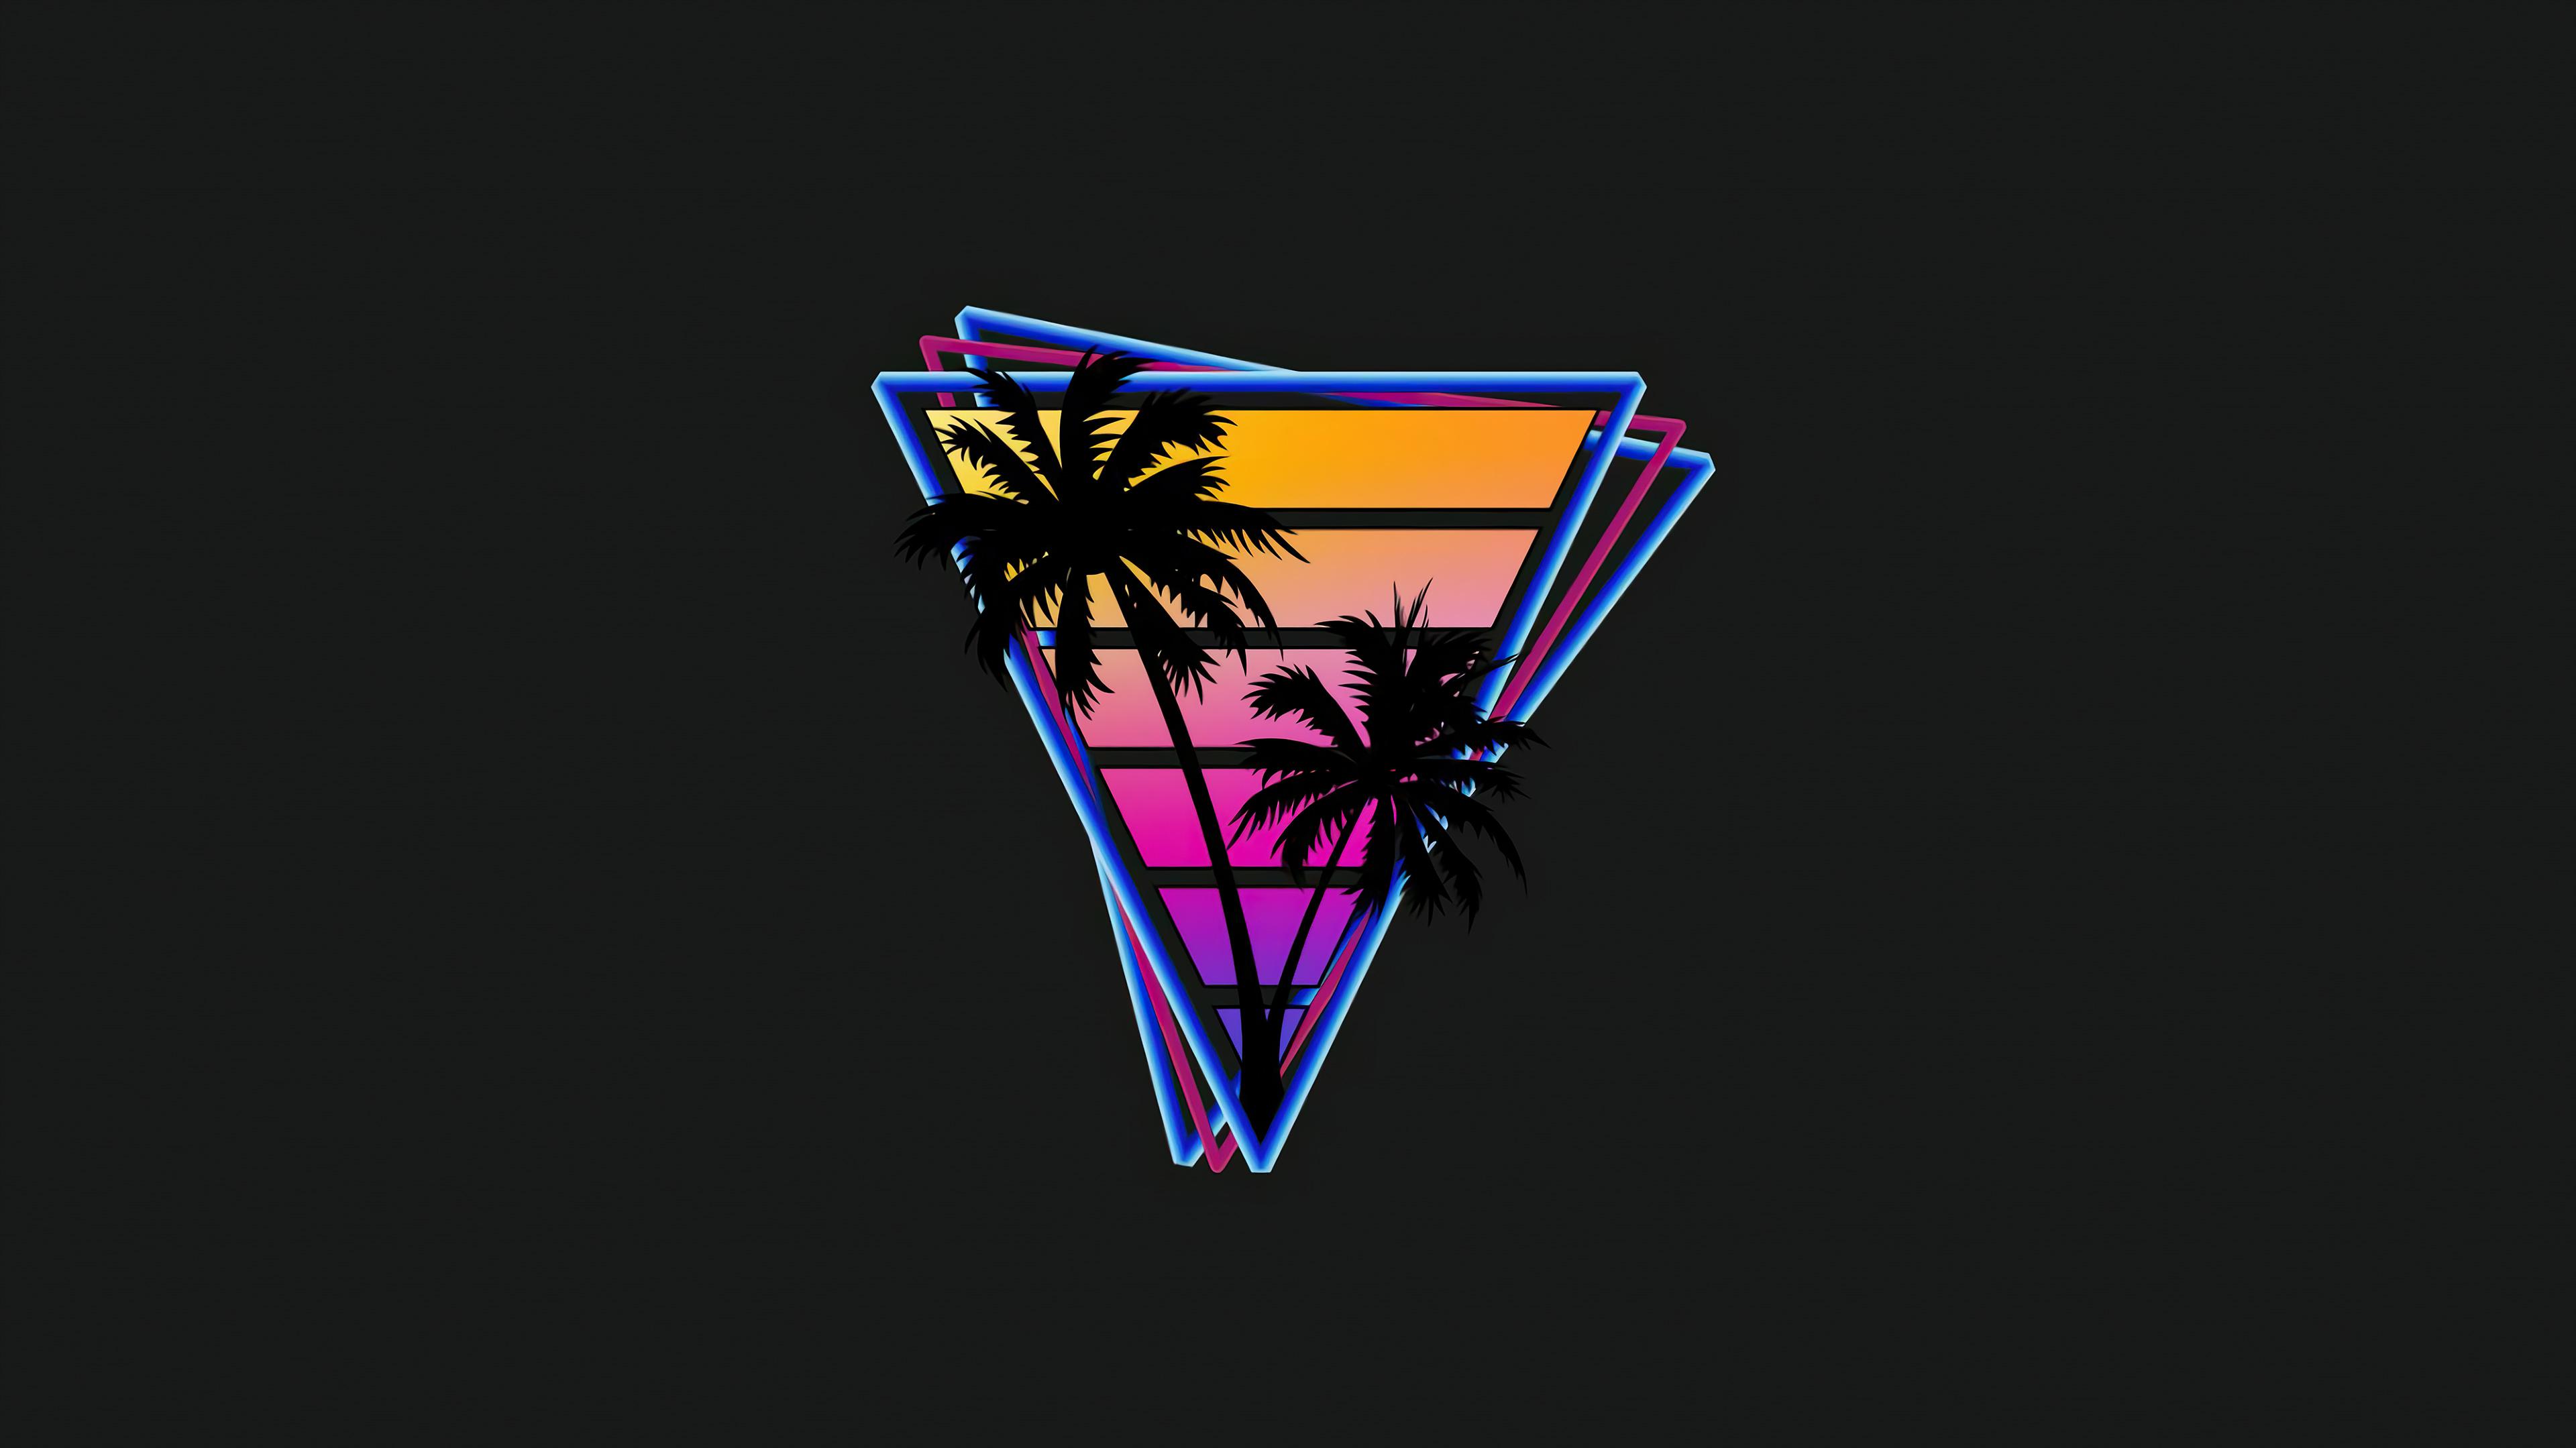 vaporwave triangle palm trees 4k 1608579496 - Vaporwave Triangle Palm Trees 4k - Vaporwave Triangle Palm Trees 4k wallpapers